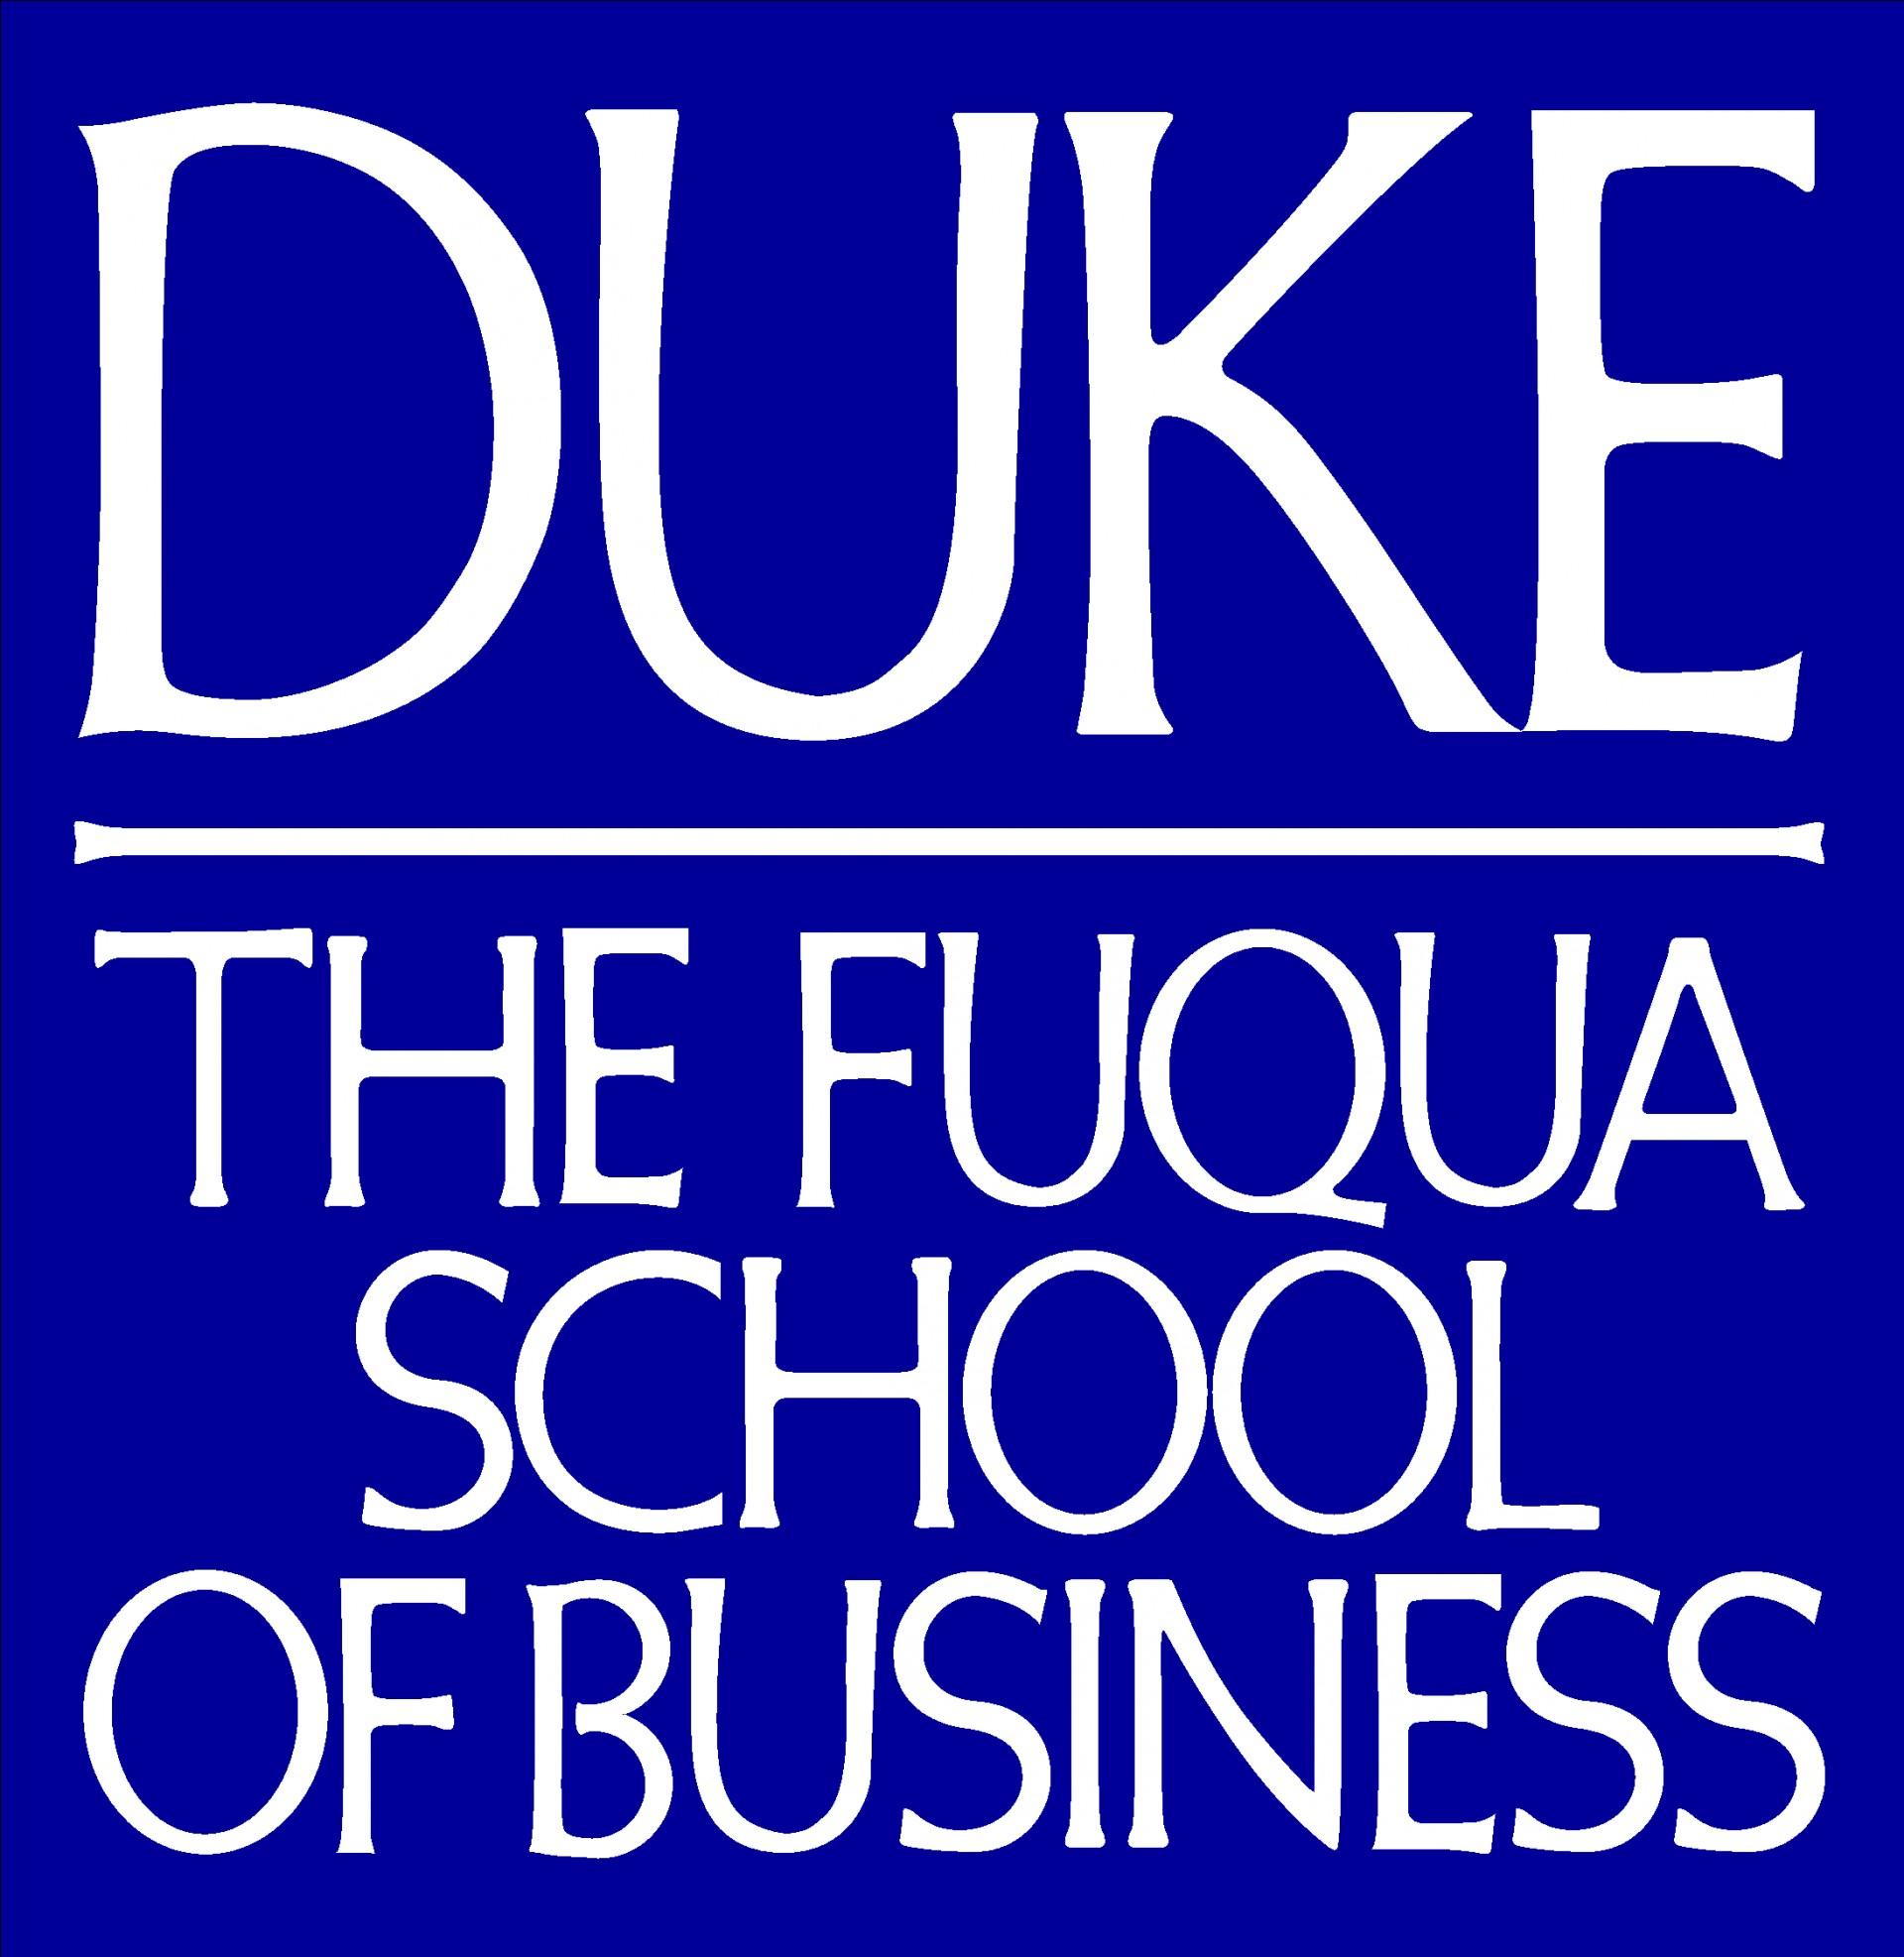 001 Fuqua Logo Rgb000099 Essay Example Duke Mba Archaicawful Essays Analysis Examples 1920